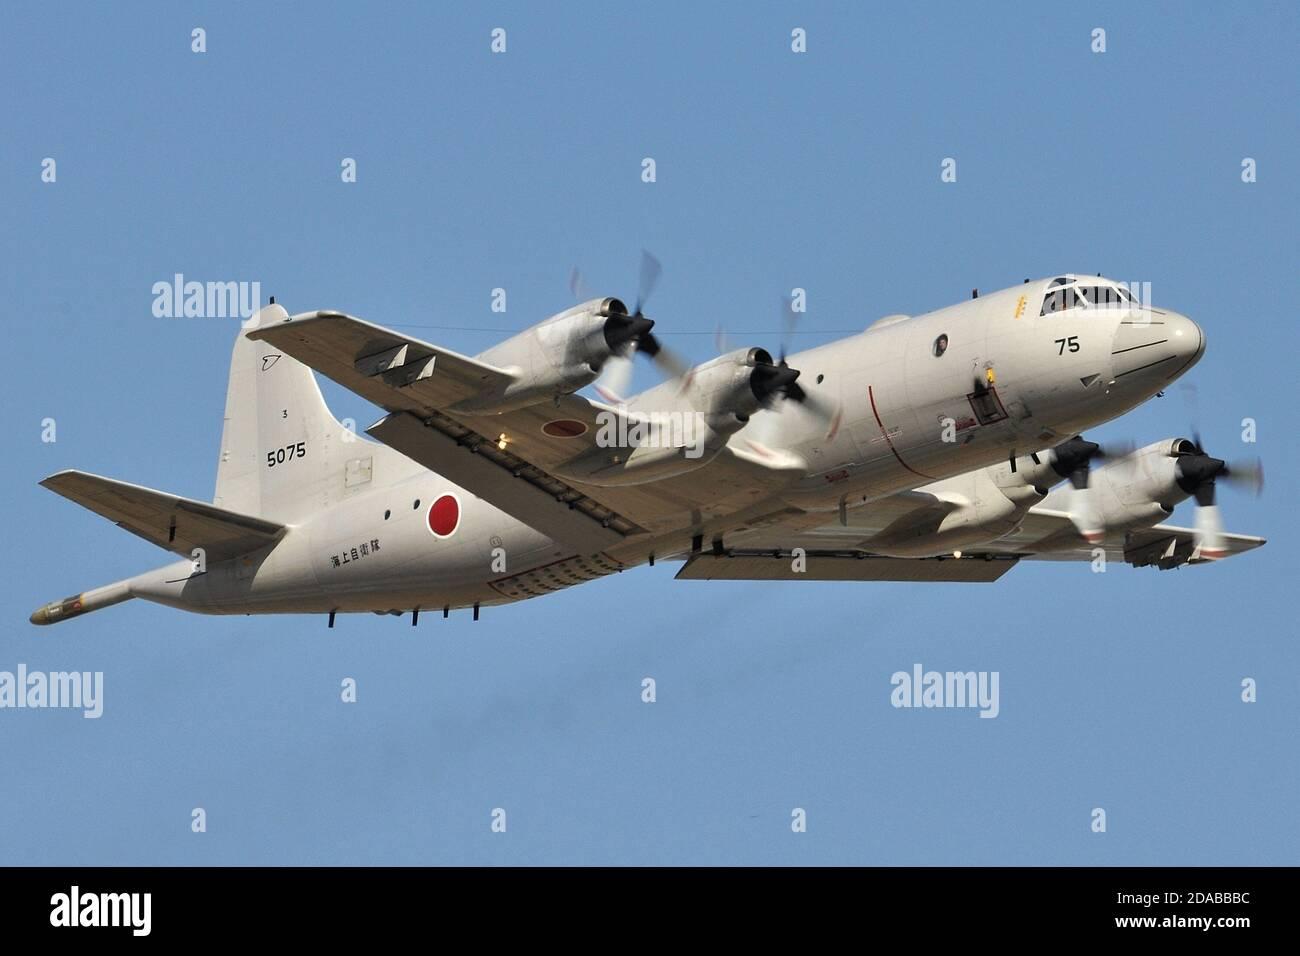 LOCKHEED P-3C ORION MARITIME PATROL AIRCRAFT OF THE JAPANESE NAVY (JMSDF). Stock Photo